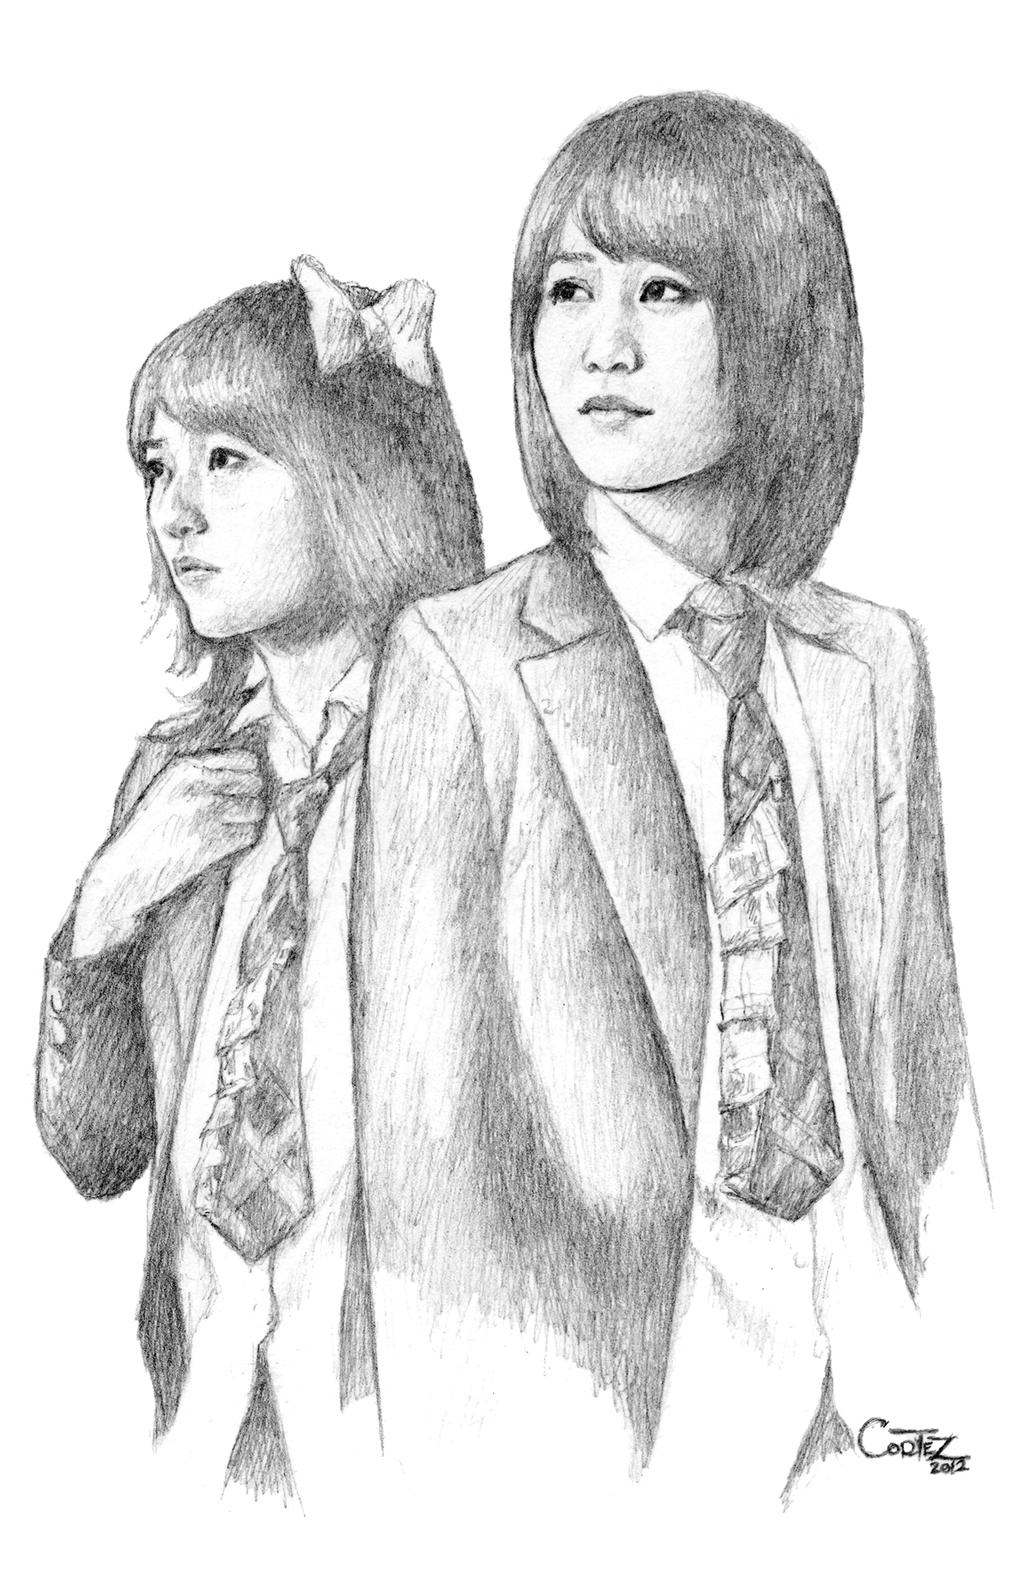 AKB48: Takahashi Minami and Maeda Atsuko - Forever by Sumo0172